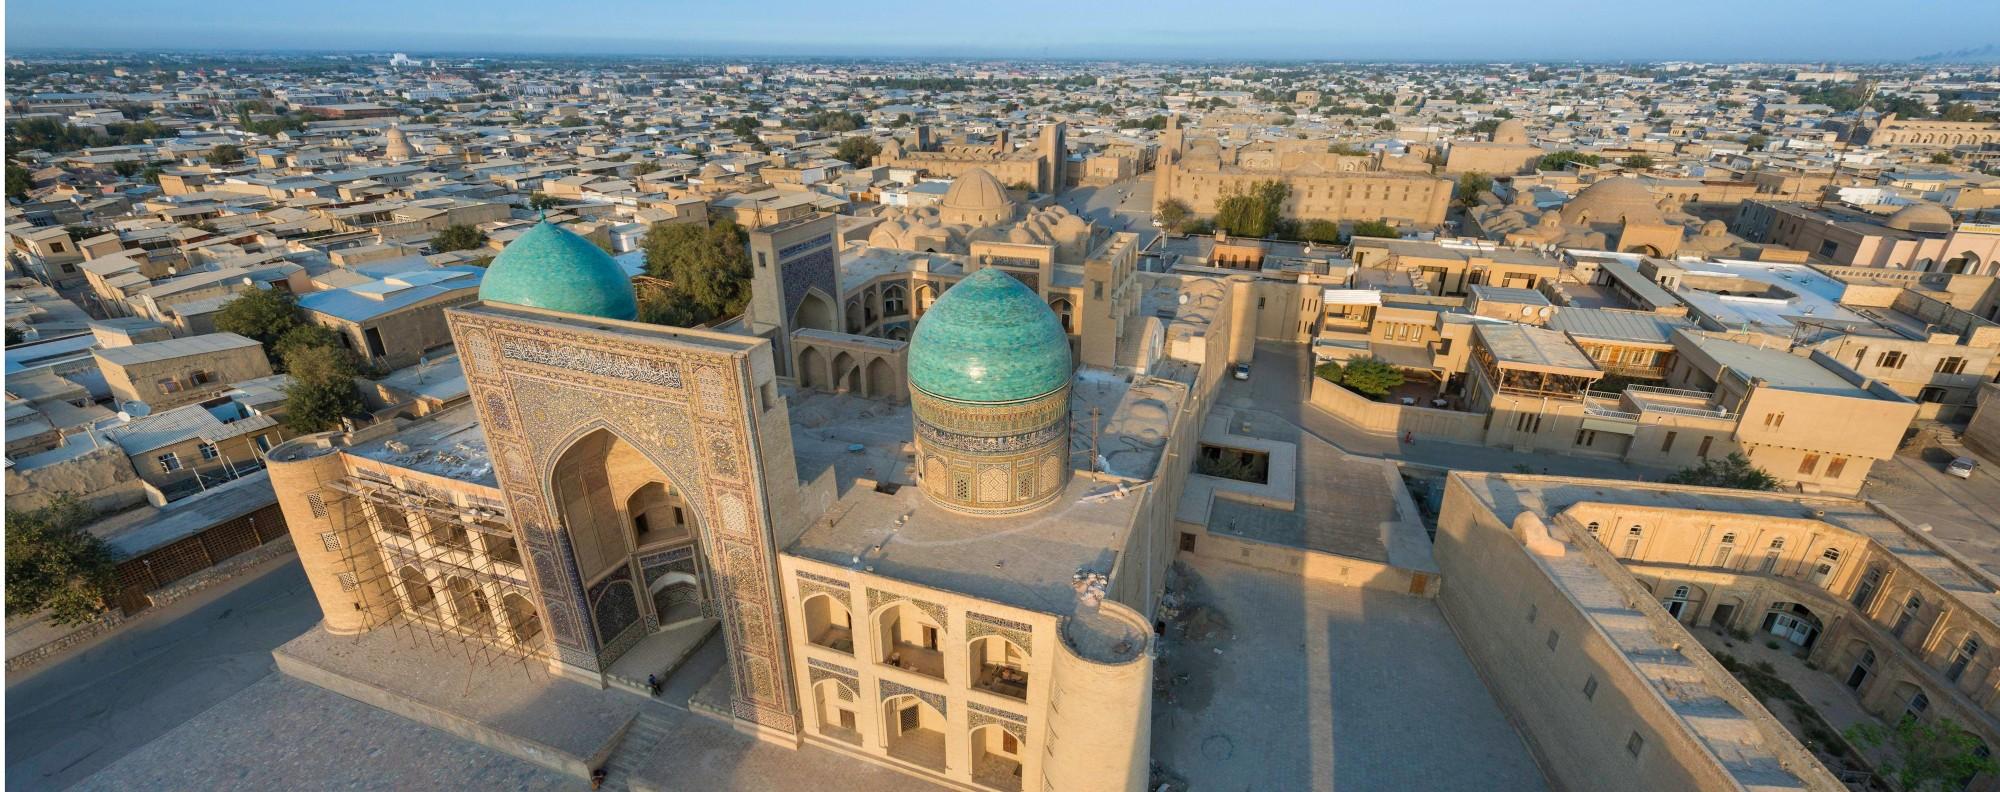 The historic centre of Bukhara, Uzbekistan. Picture: Alamy